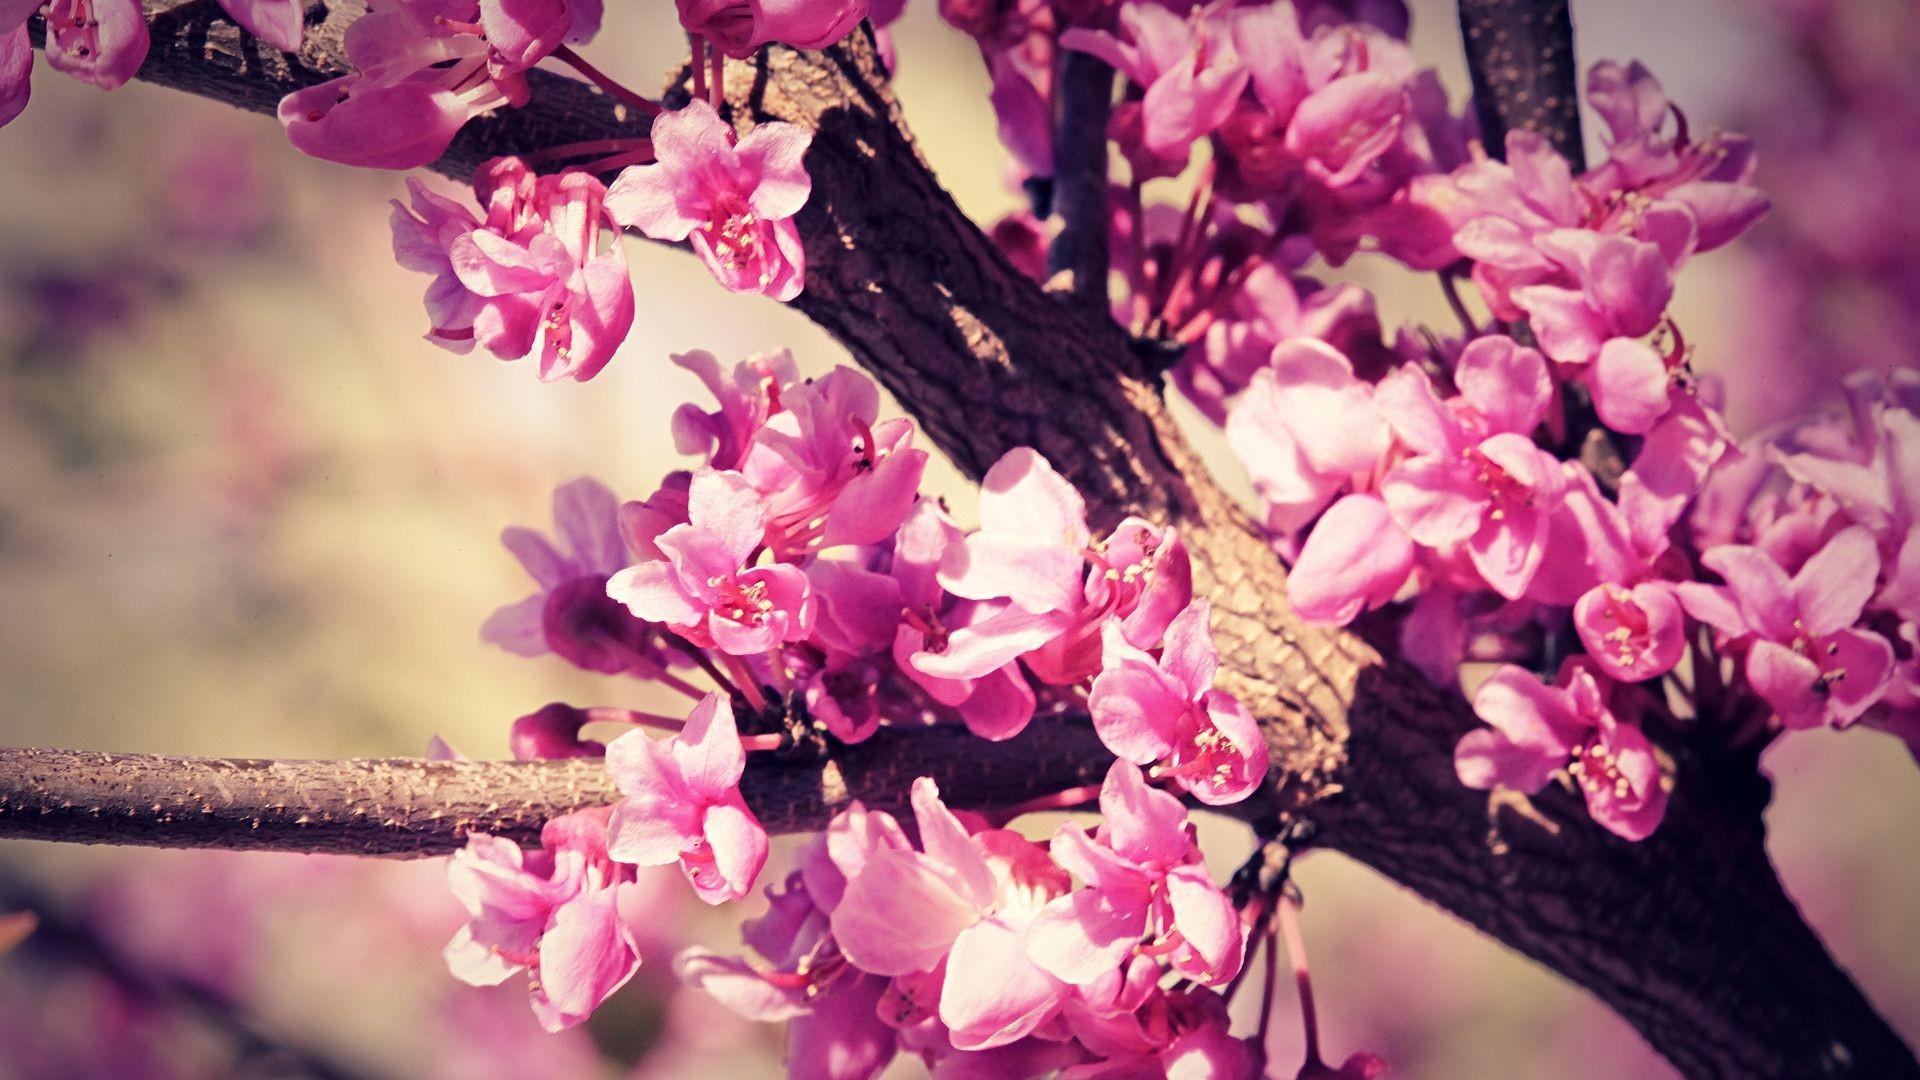 1000x833px Cute Tumblr Pink Wallpaper